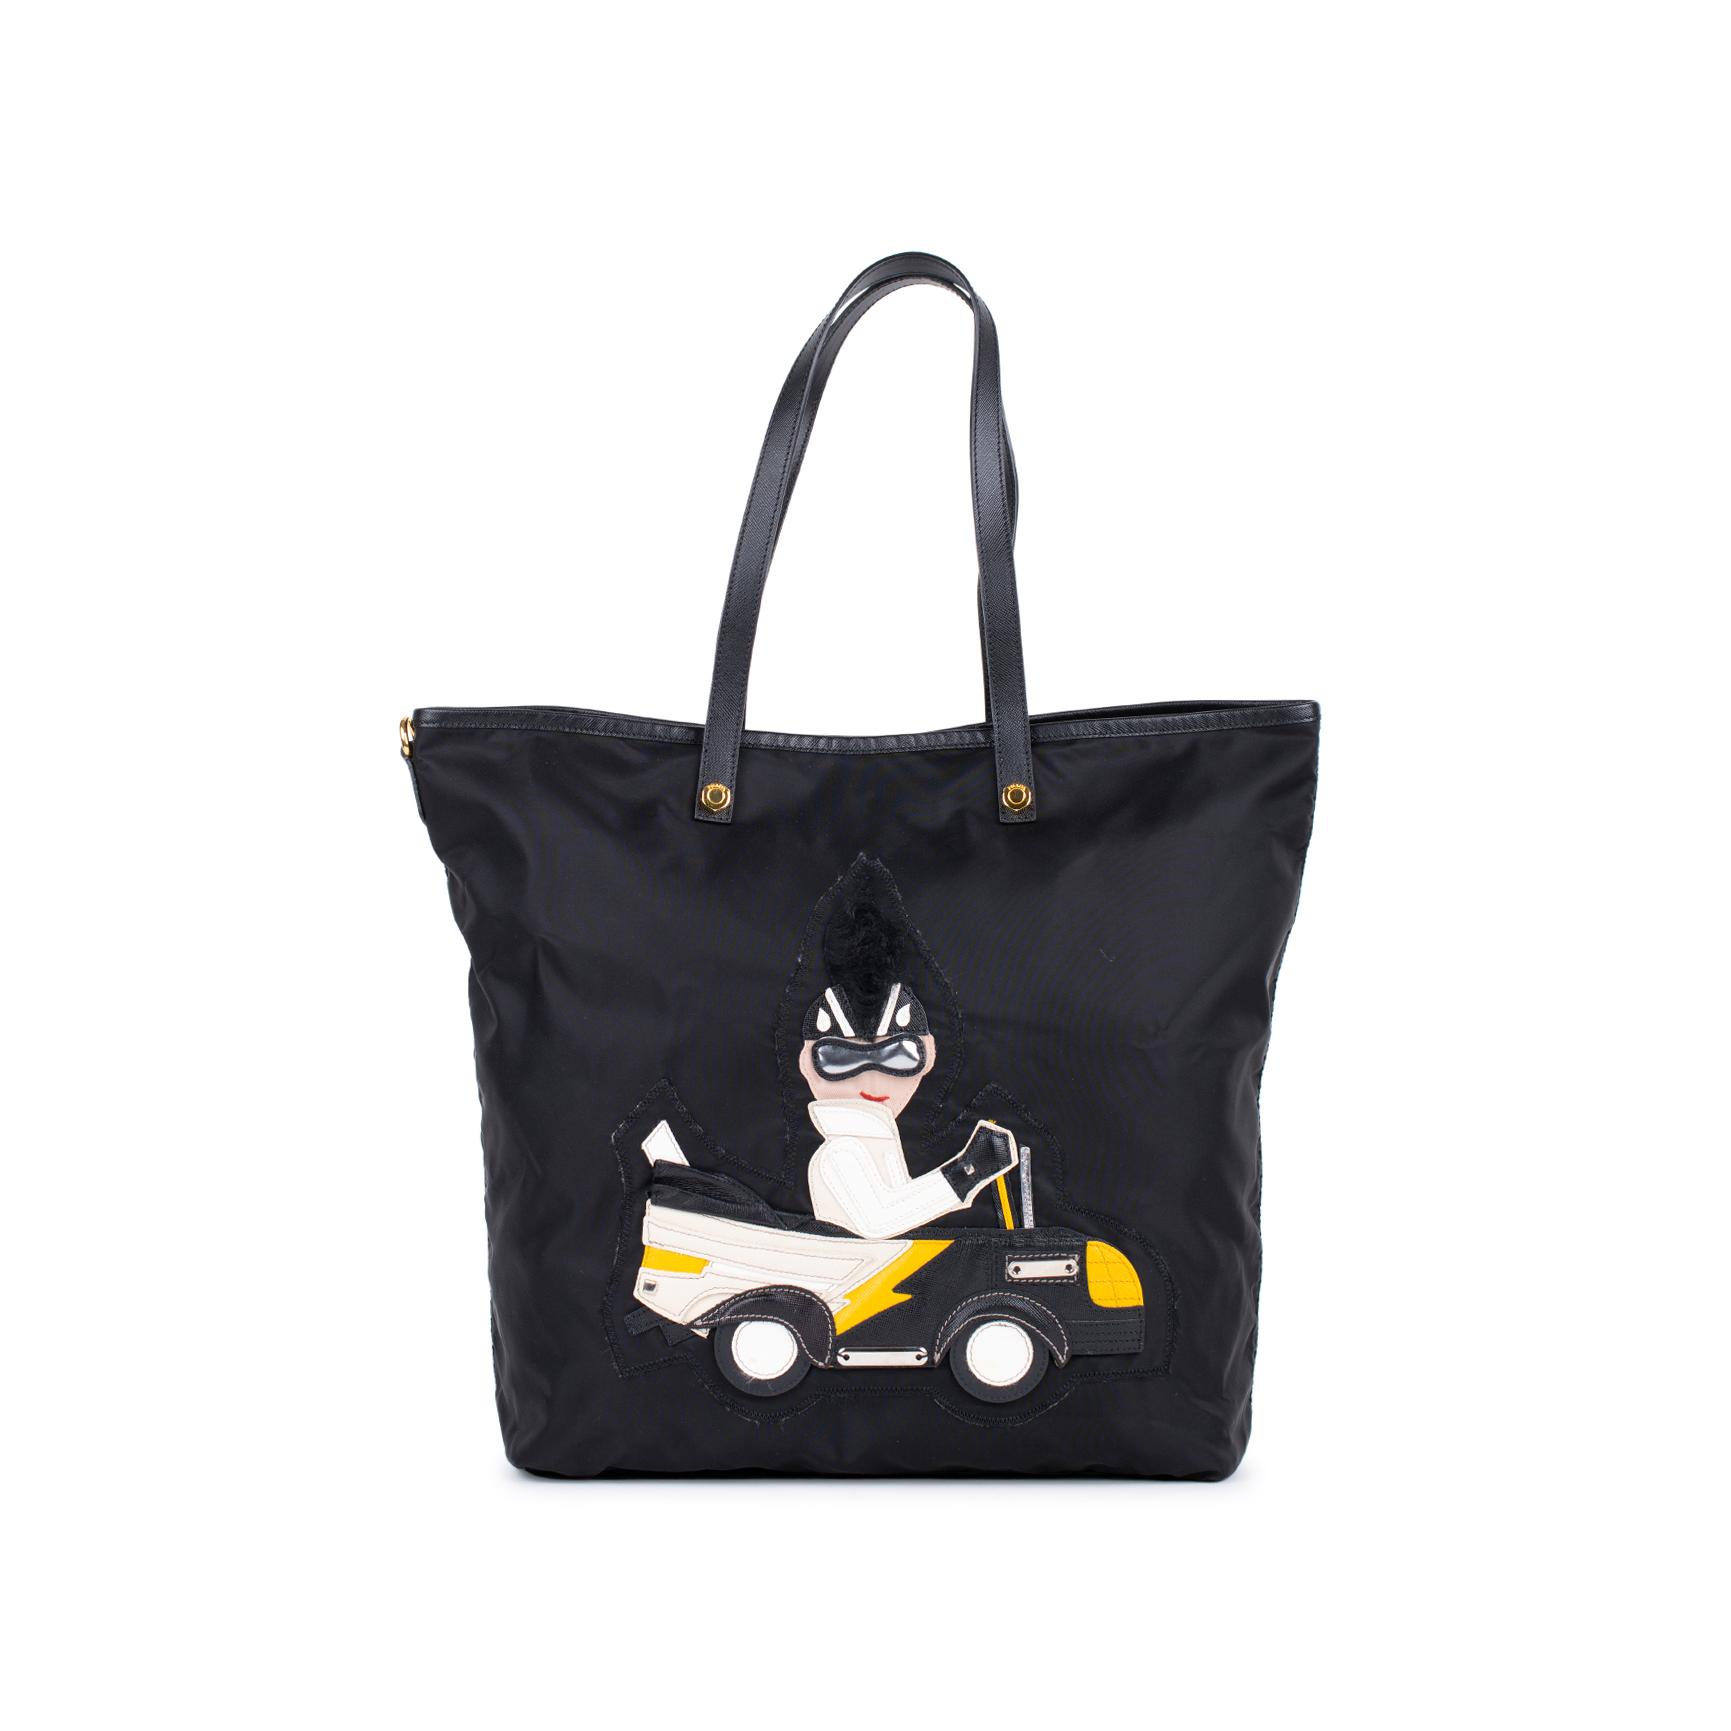 aaa0983375 Authentic Second Hand Prada Nylon Tote Bag (PSS-333-00029)